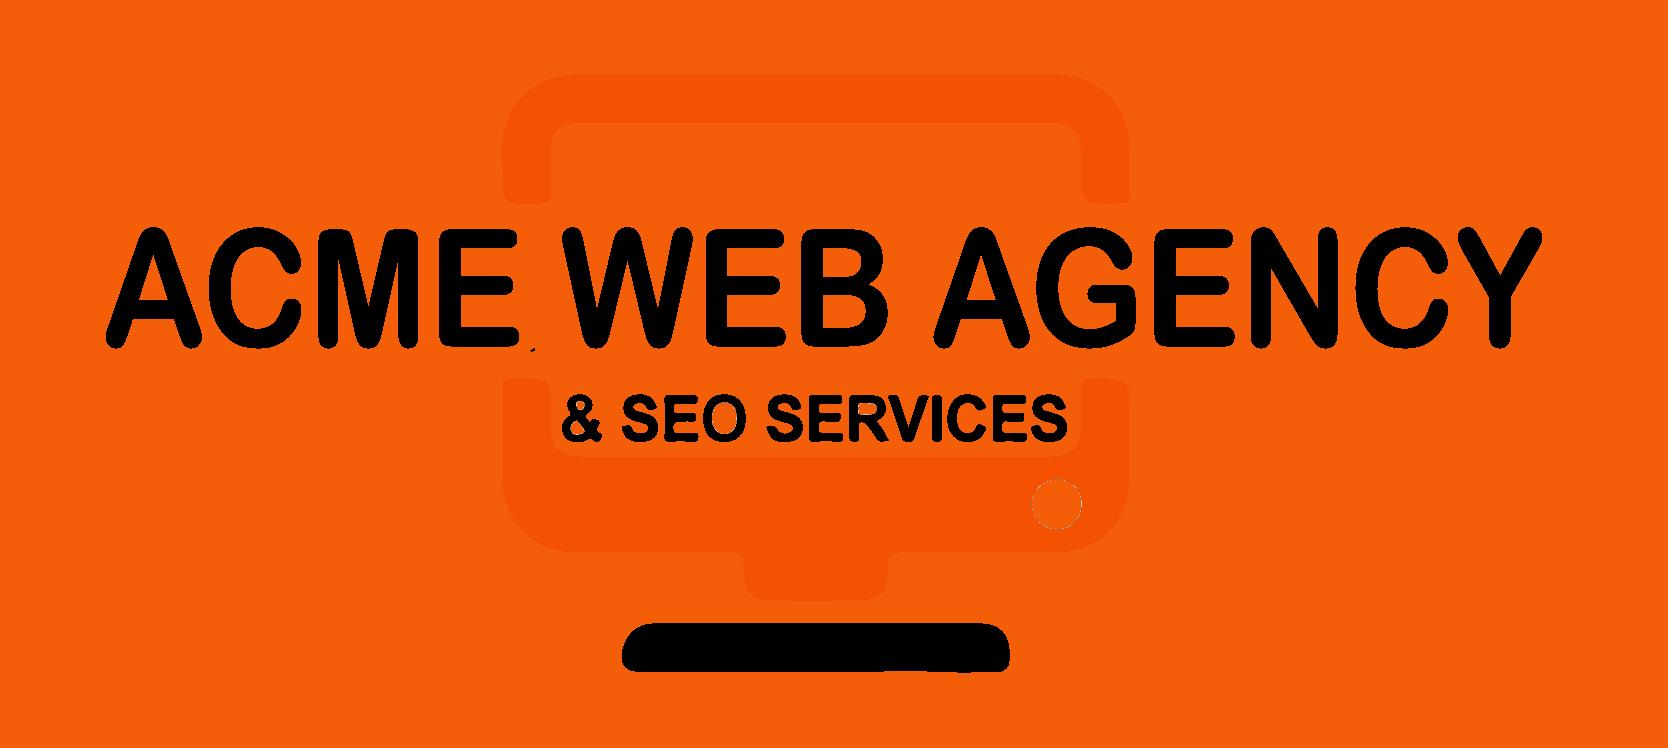 SB web agency